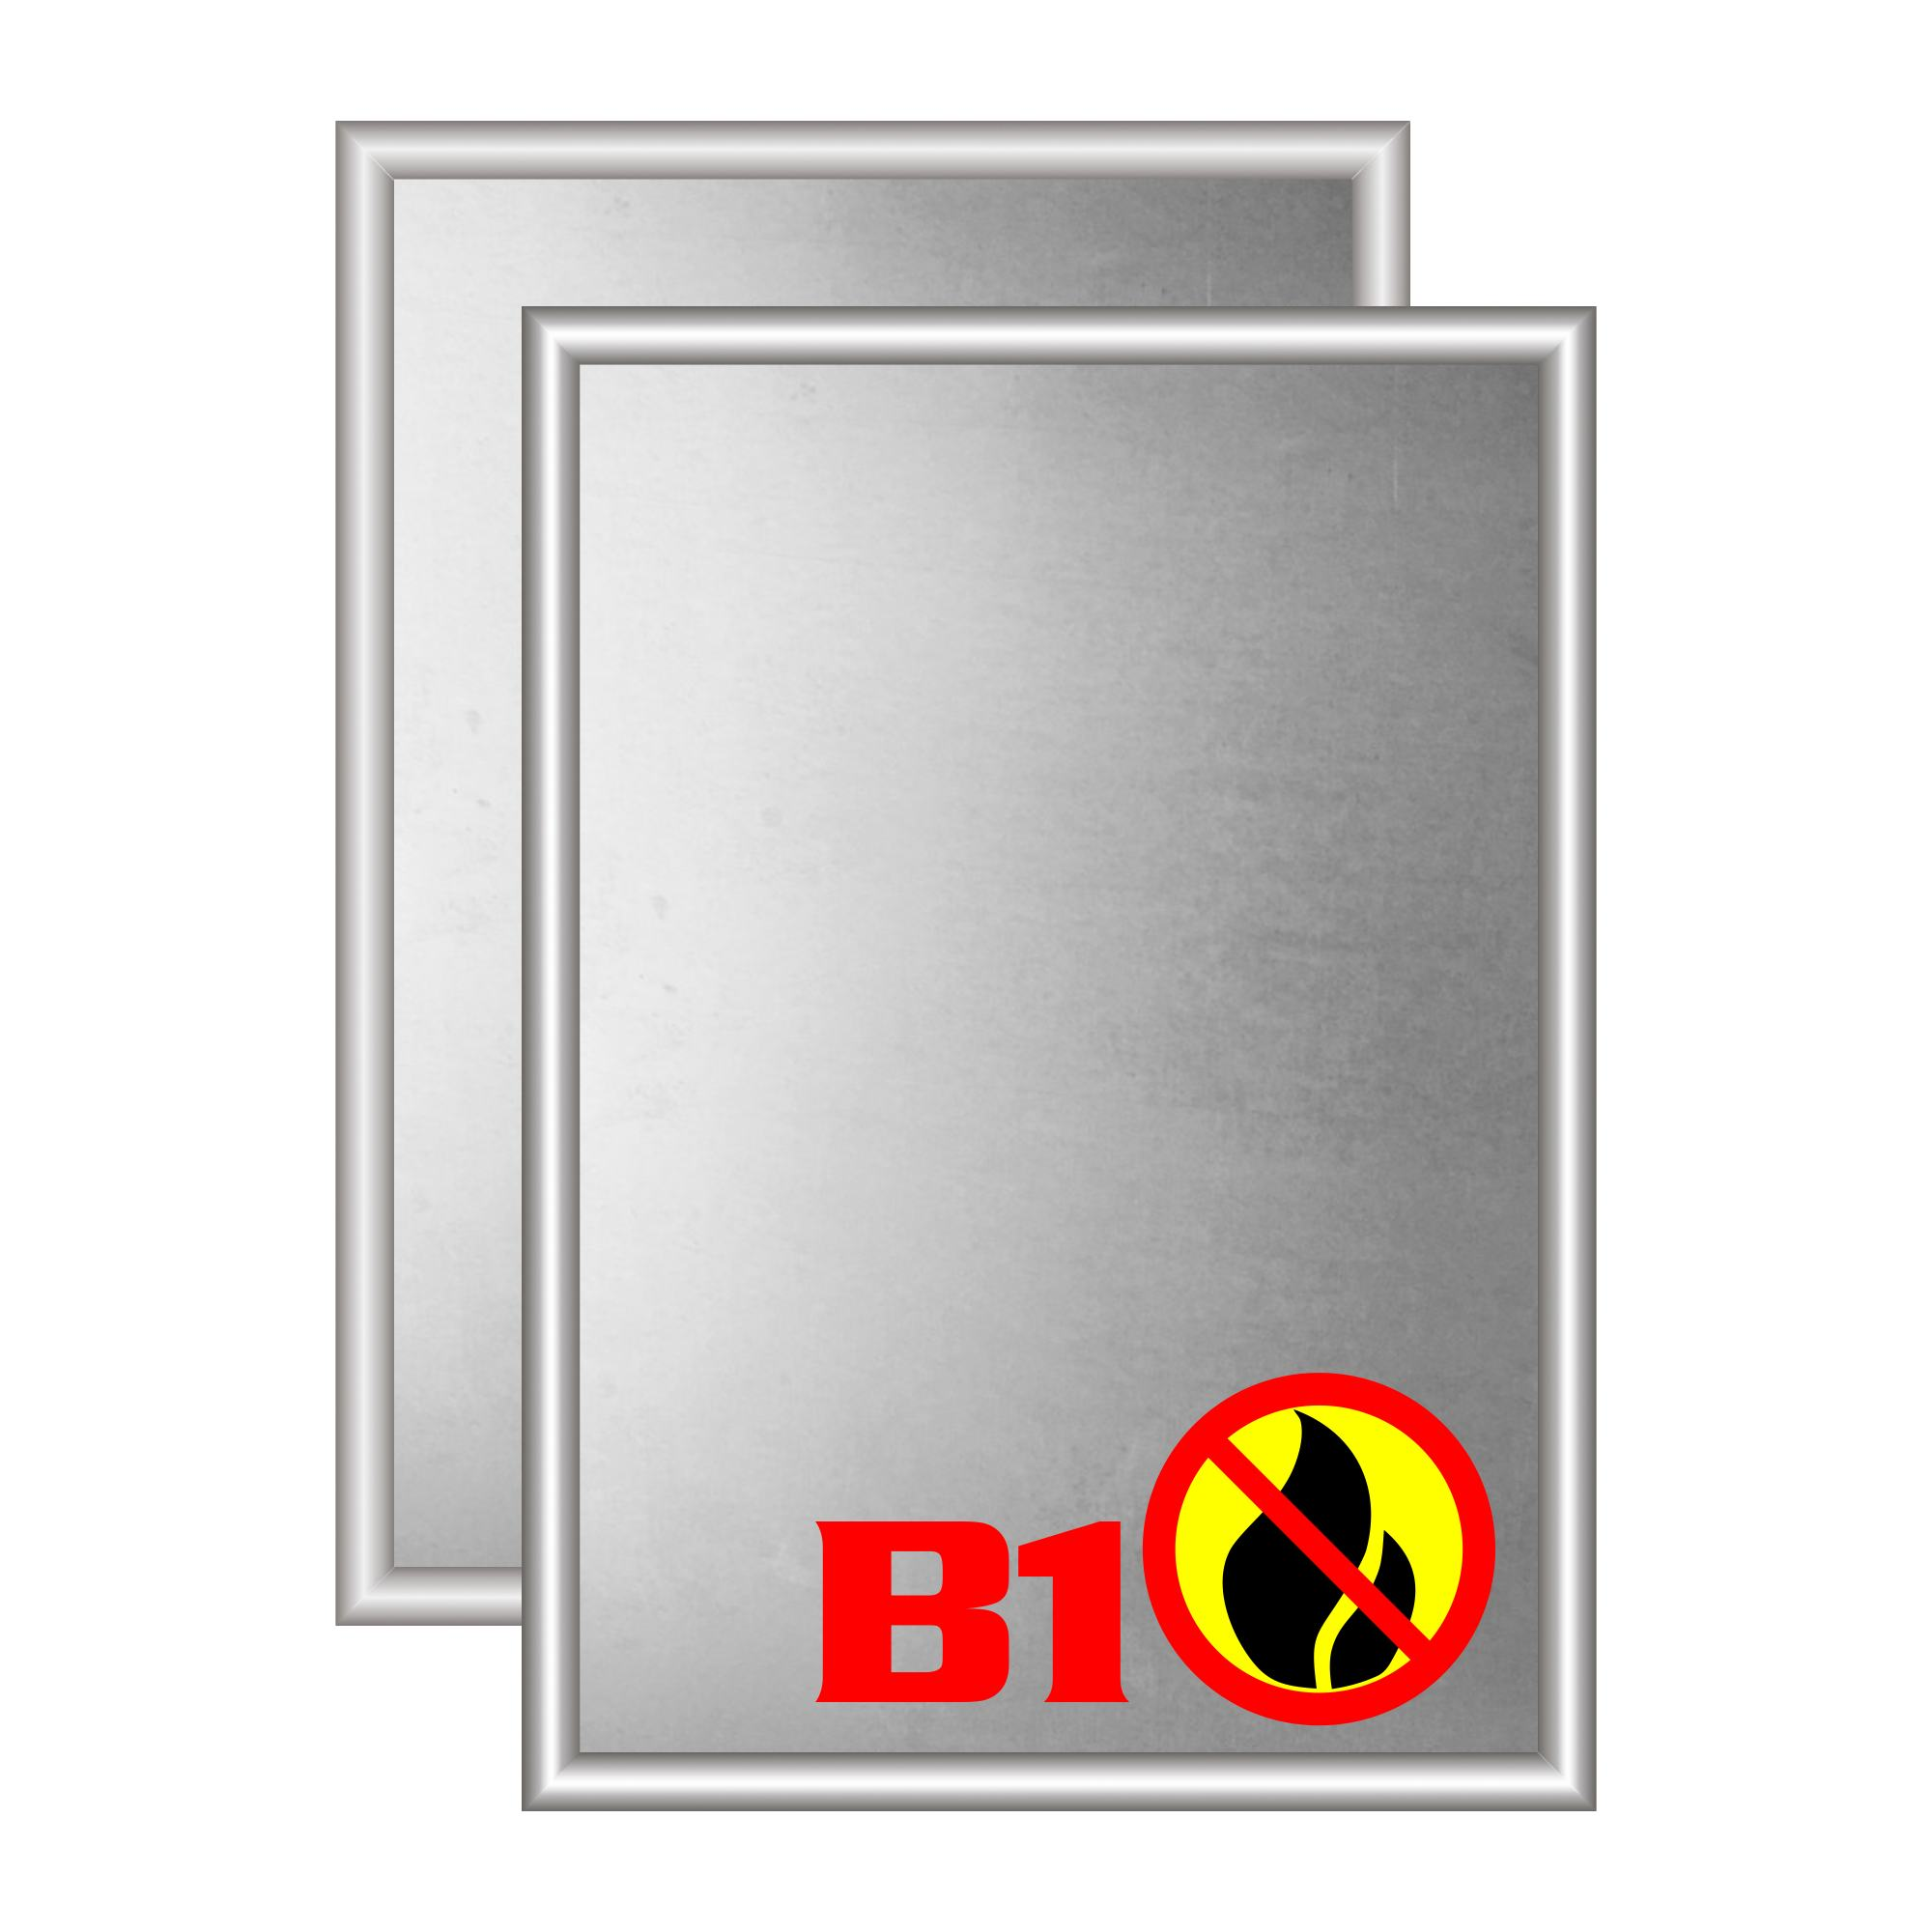 B1 Schwerentflammbarer Klapprahmen